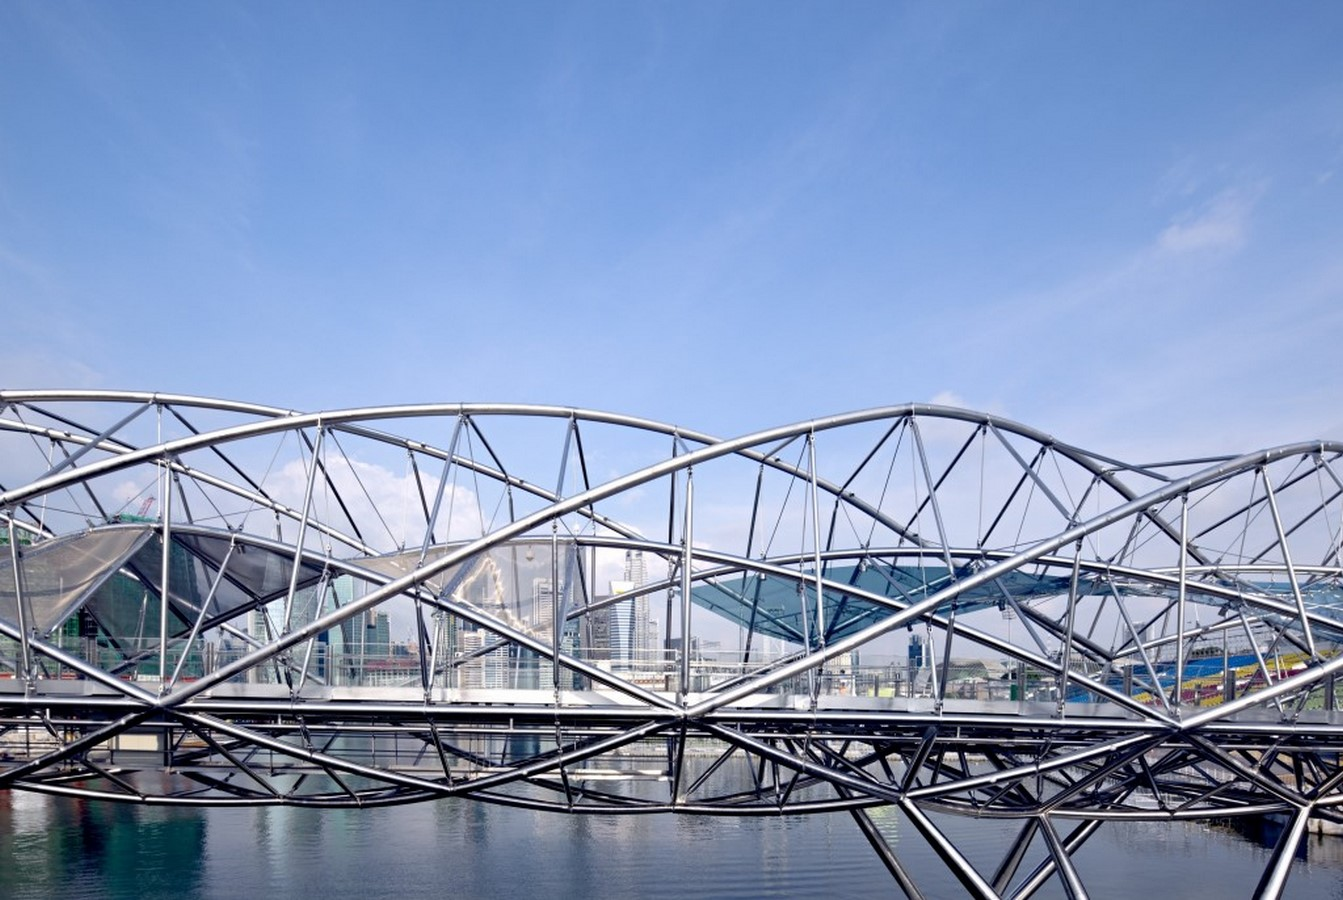 Architecture in Singapore - Helix Bridge - Sheet2